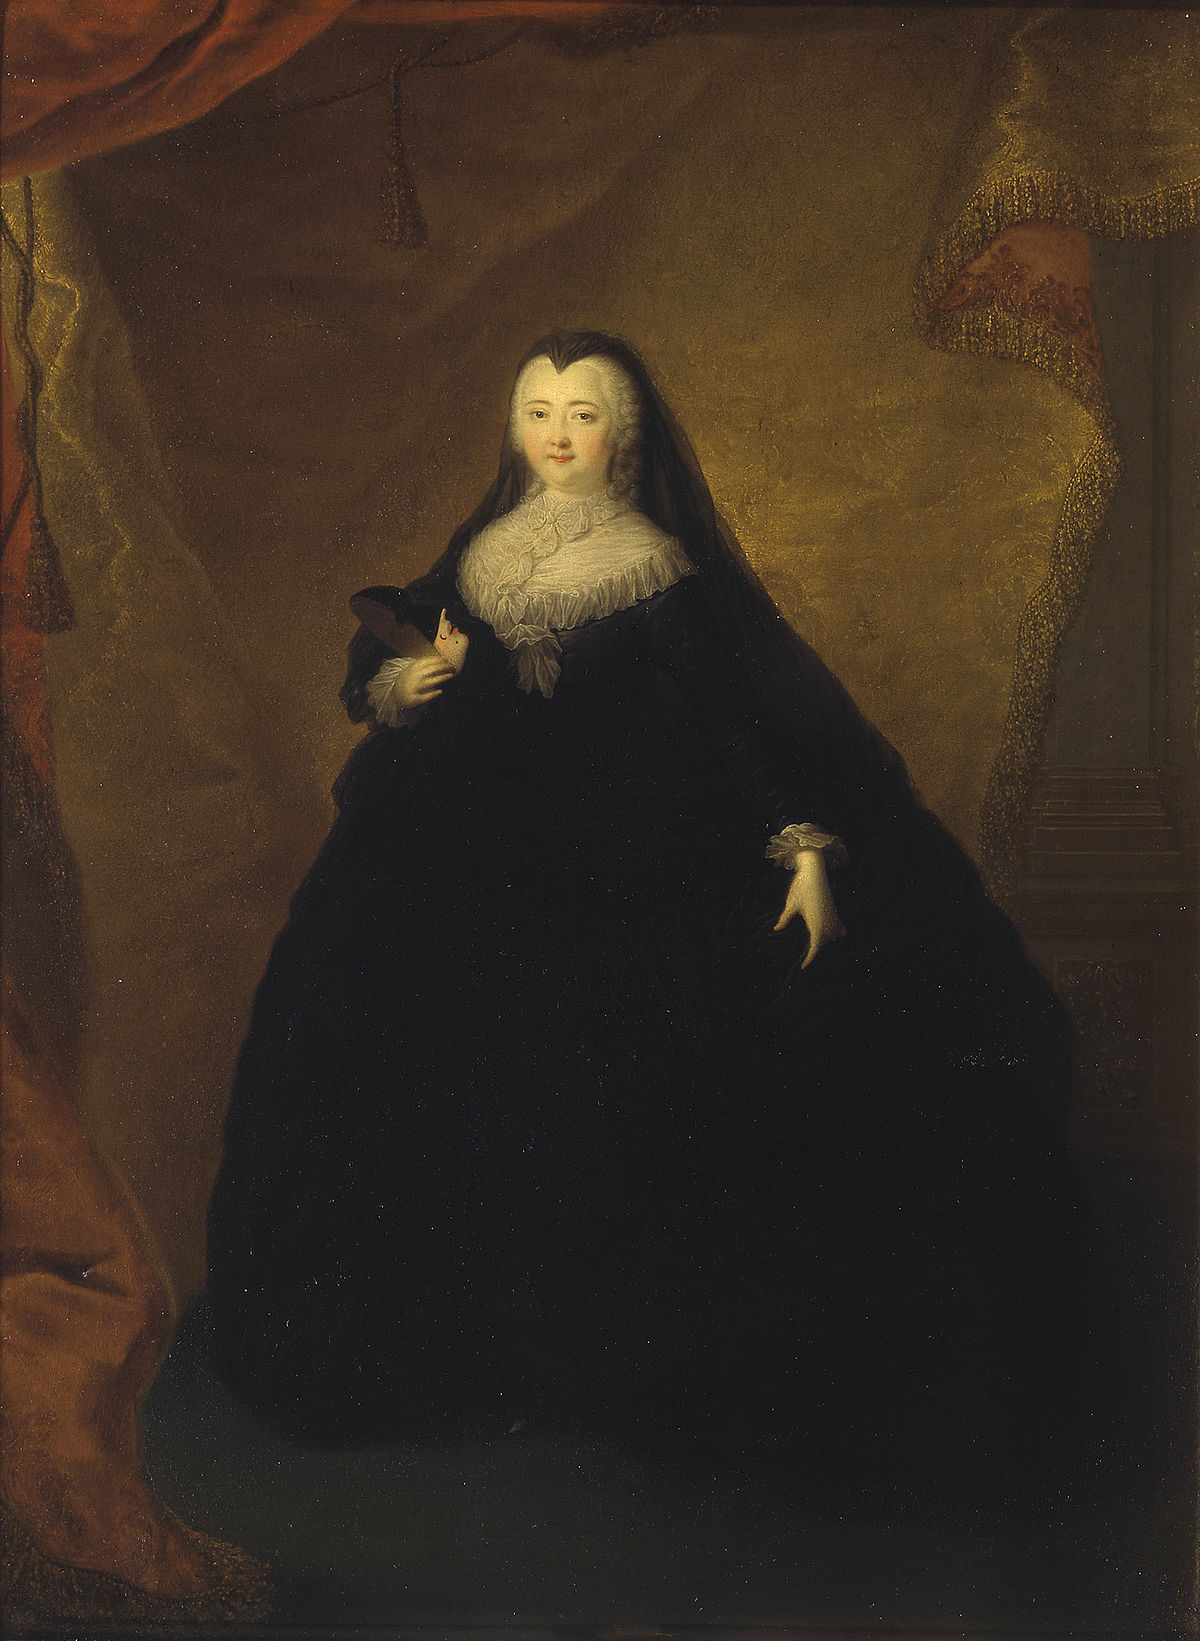 Elizabeth of Russia in masquerade dress by Grooth (1748, Tretyakov gallery).jpg